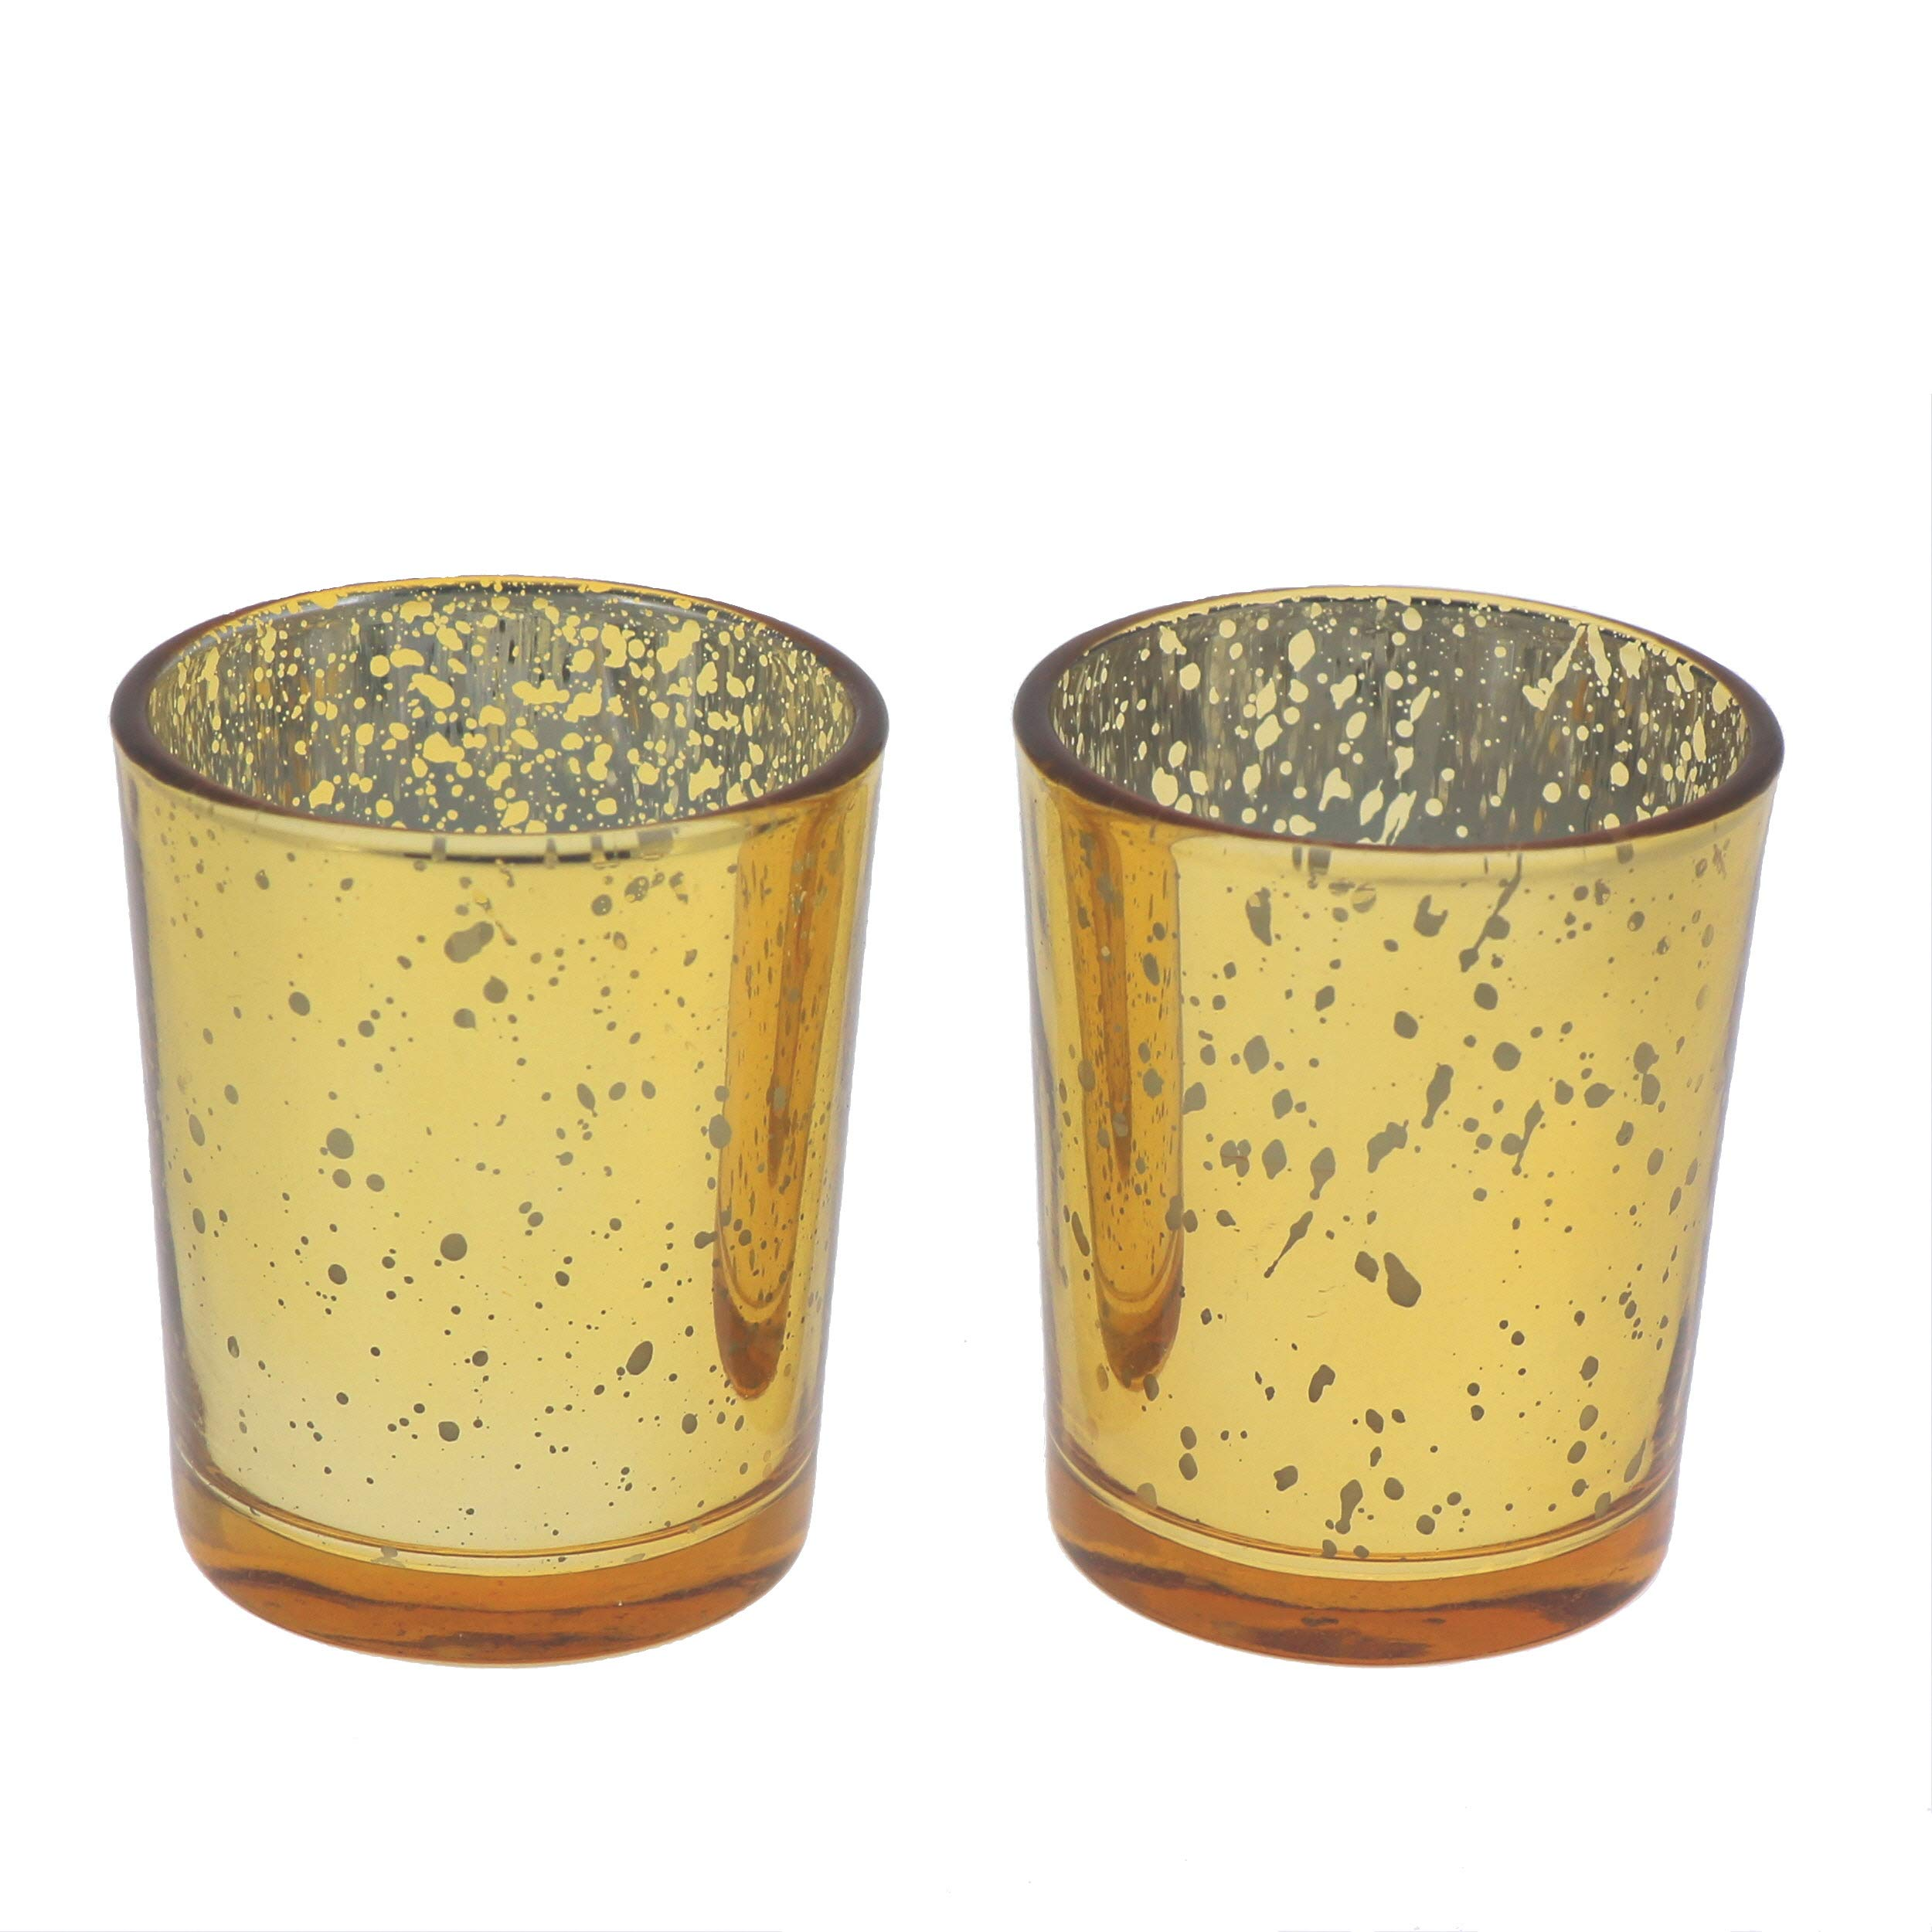 Michael Zohar Candles Mercury Glass Votive Candles | 15 Hour | Gold | Filled | Set of 72 by Michael Zohar Candles